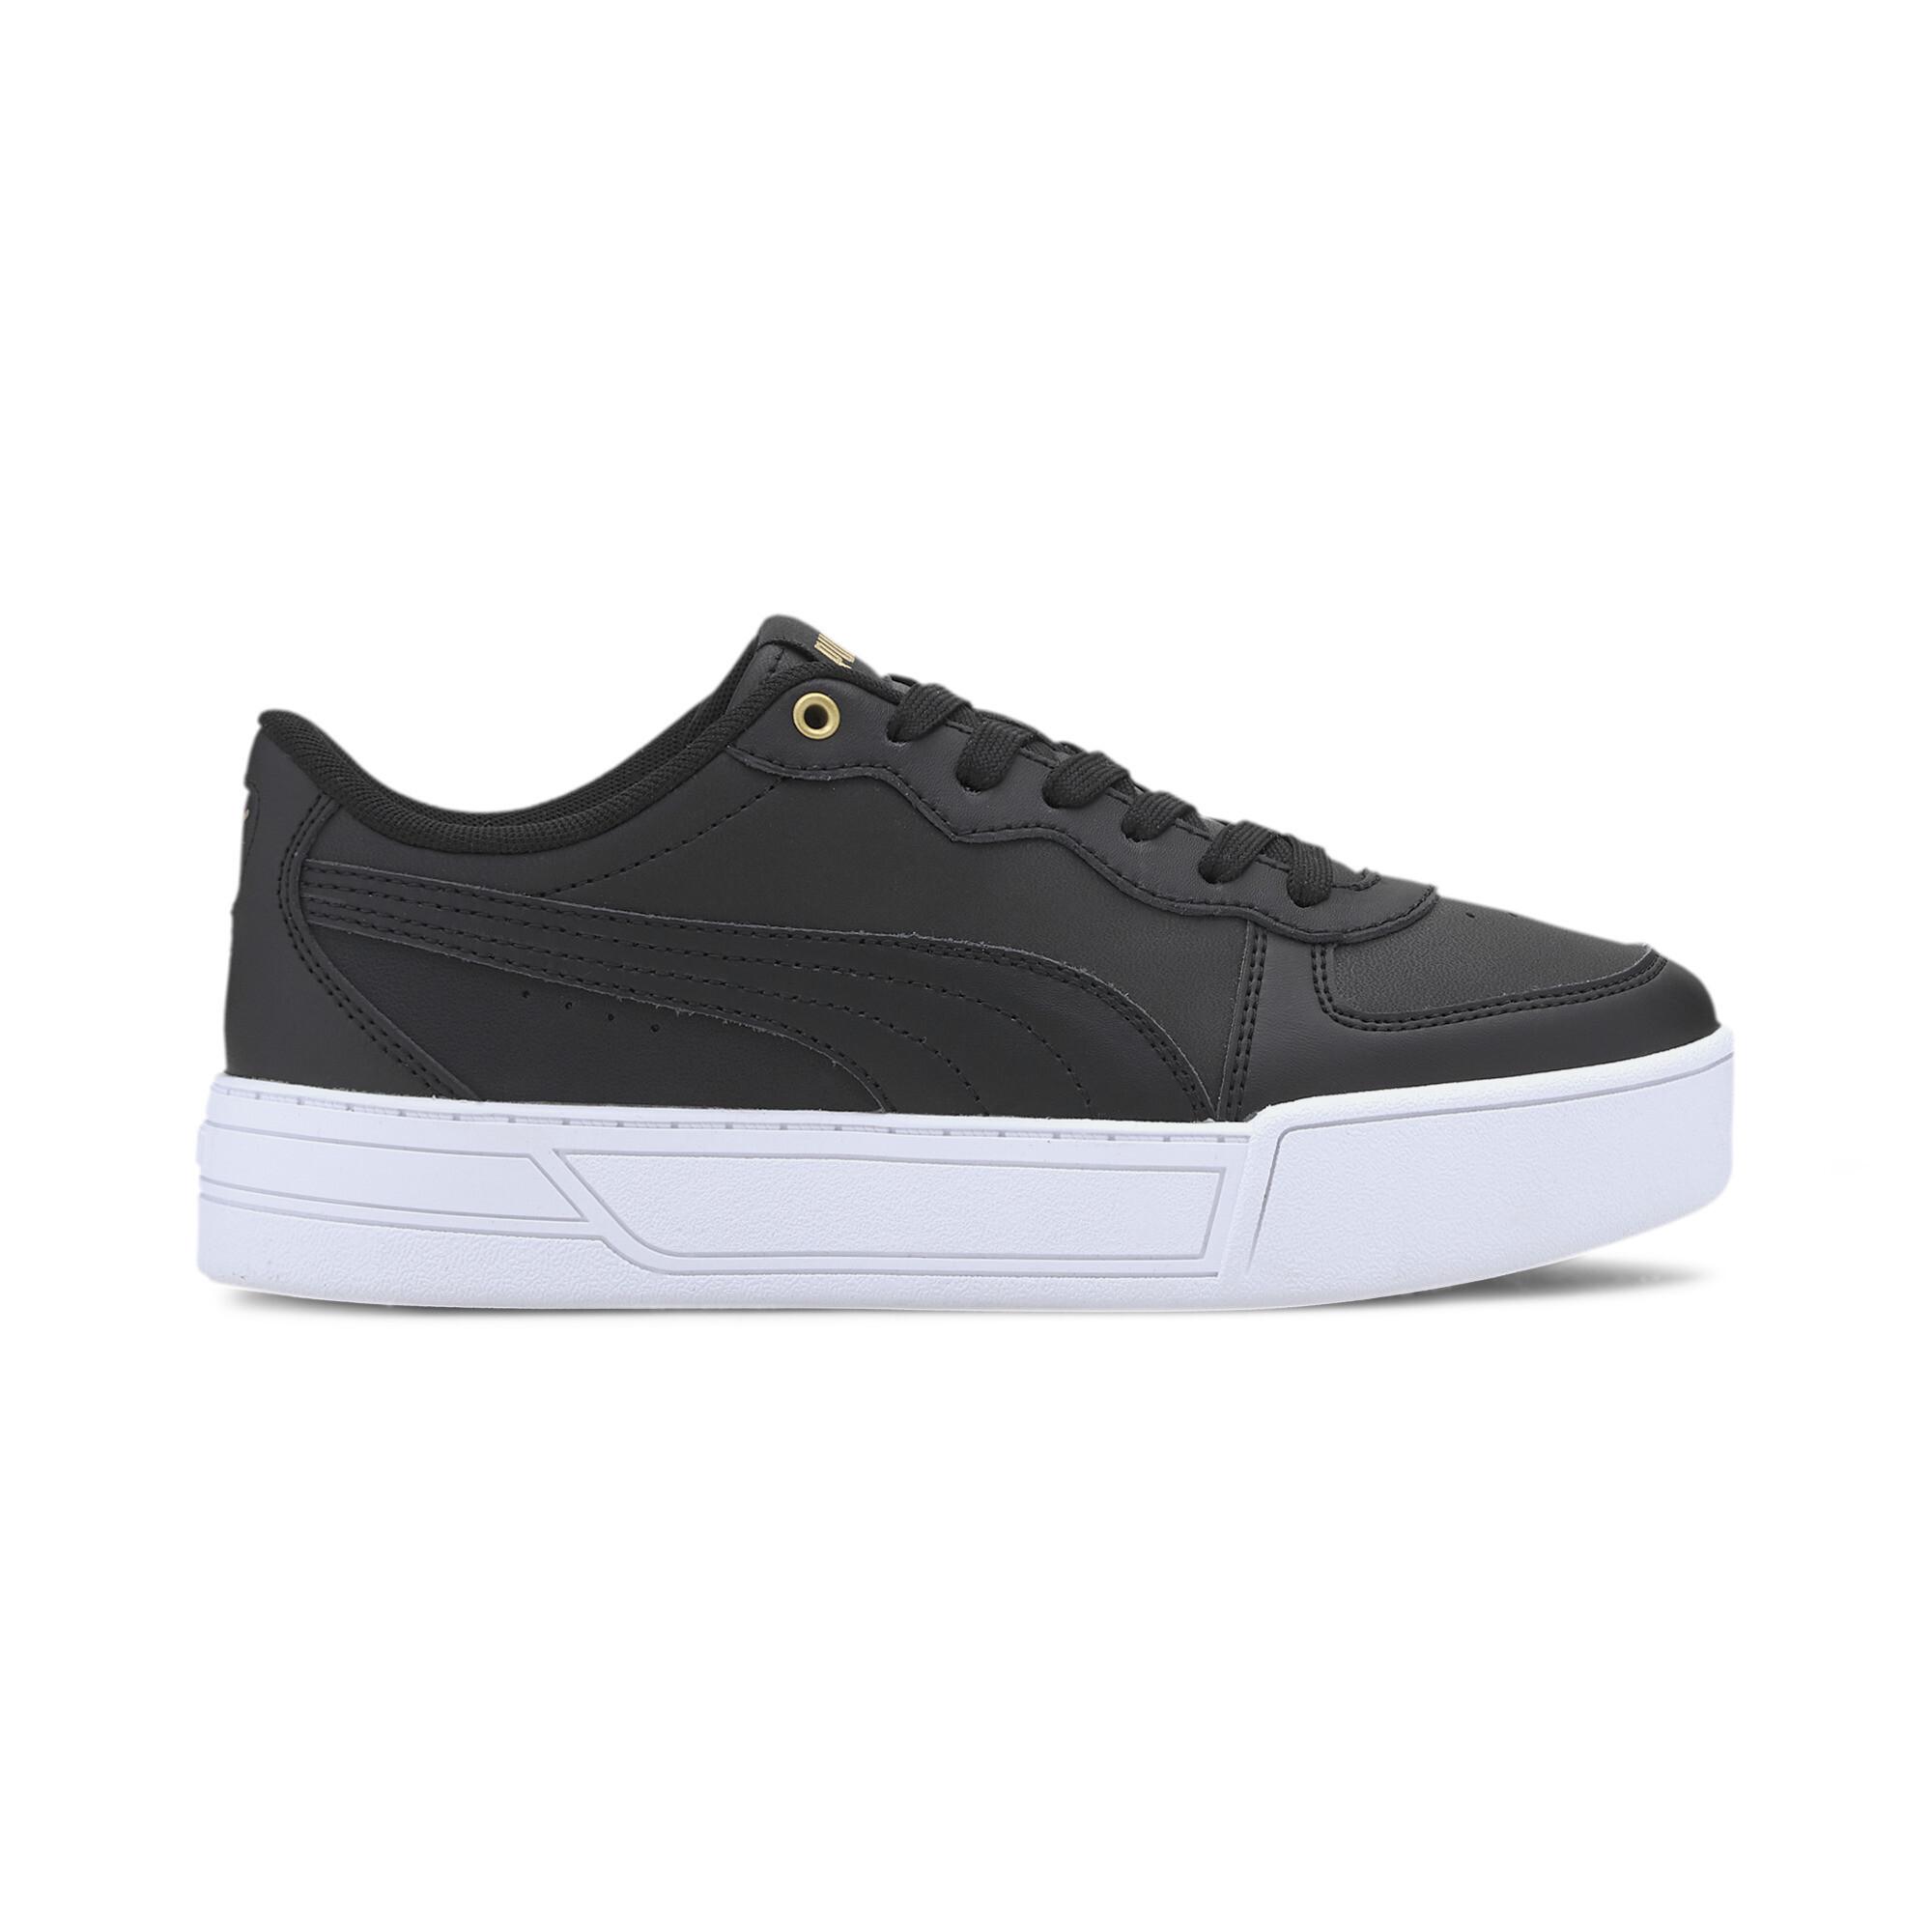 PUMA-Women-039-s-Skye-Sneakers thumbnail 12